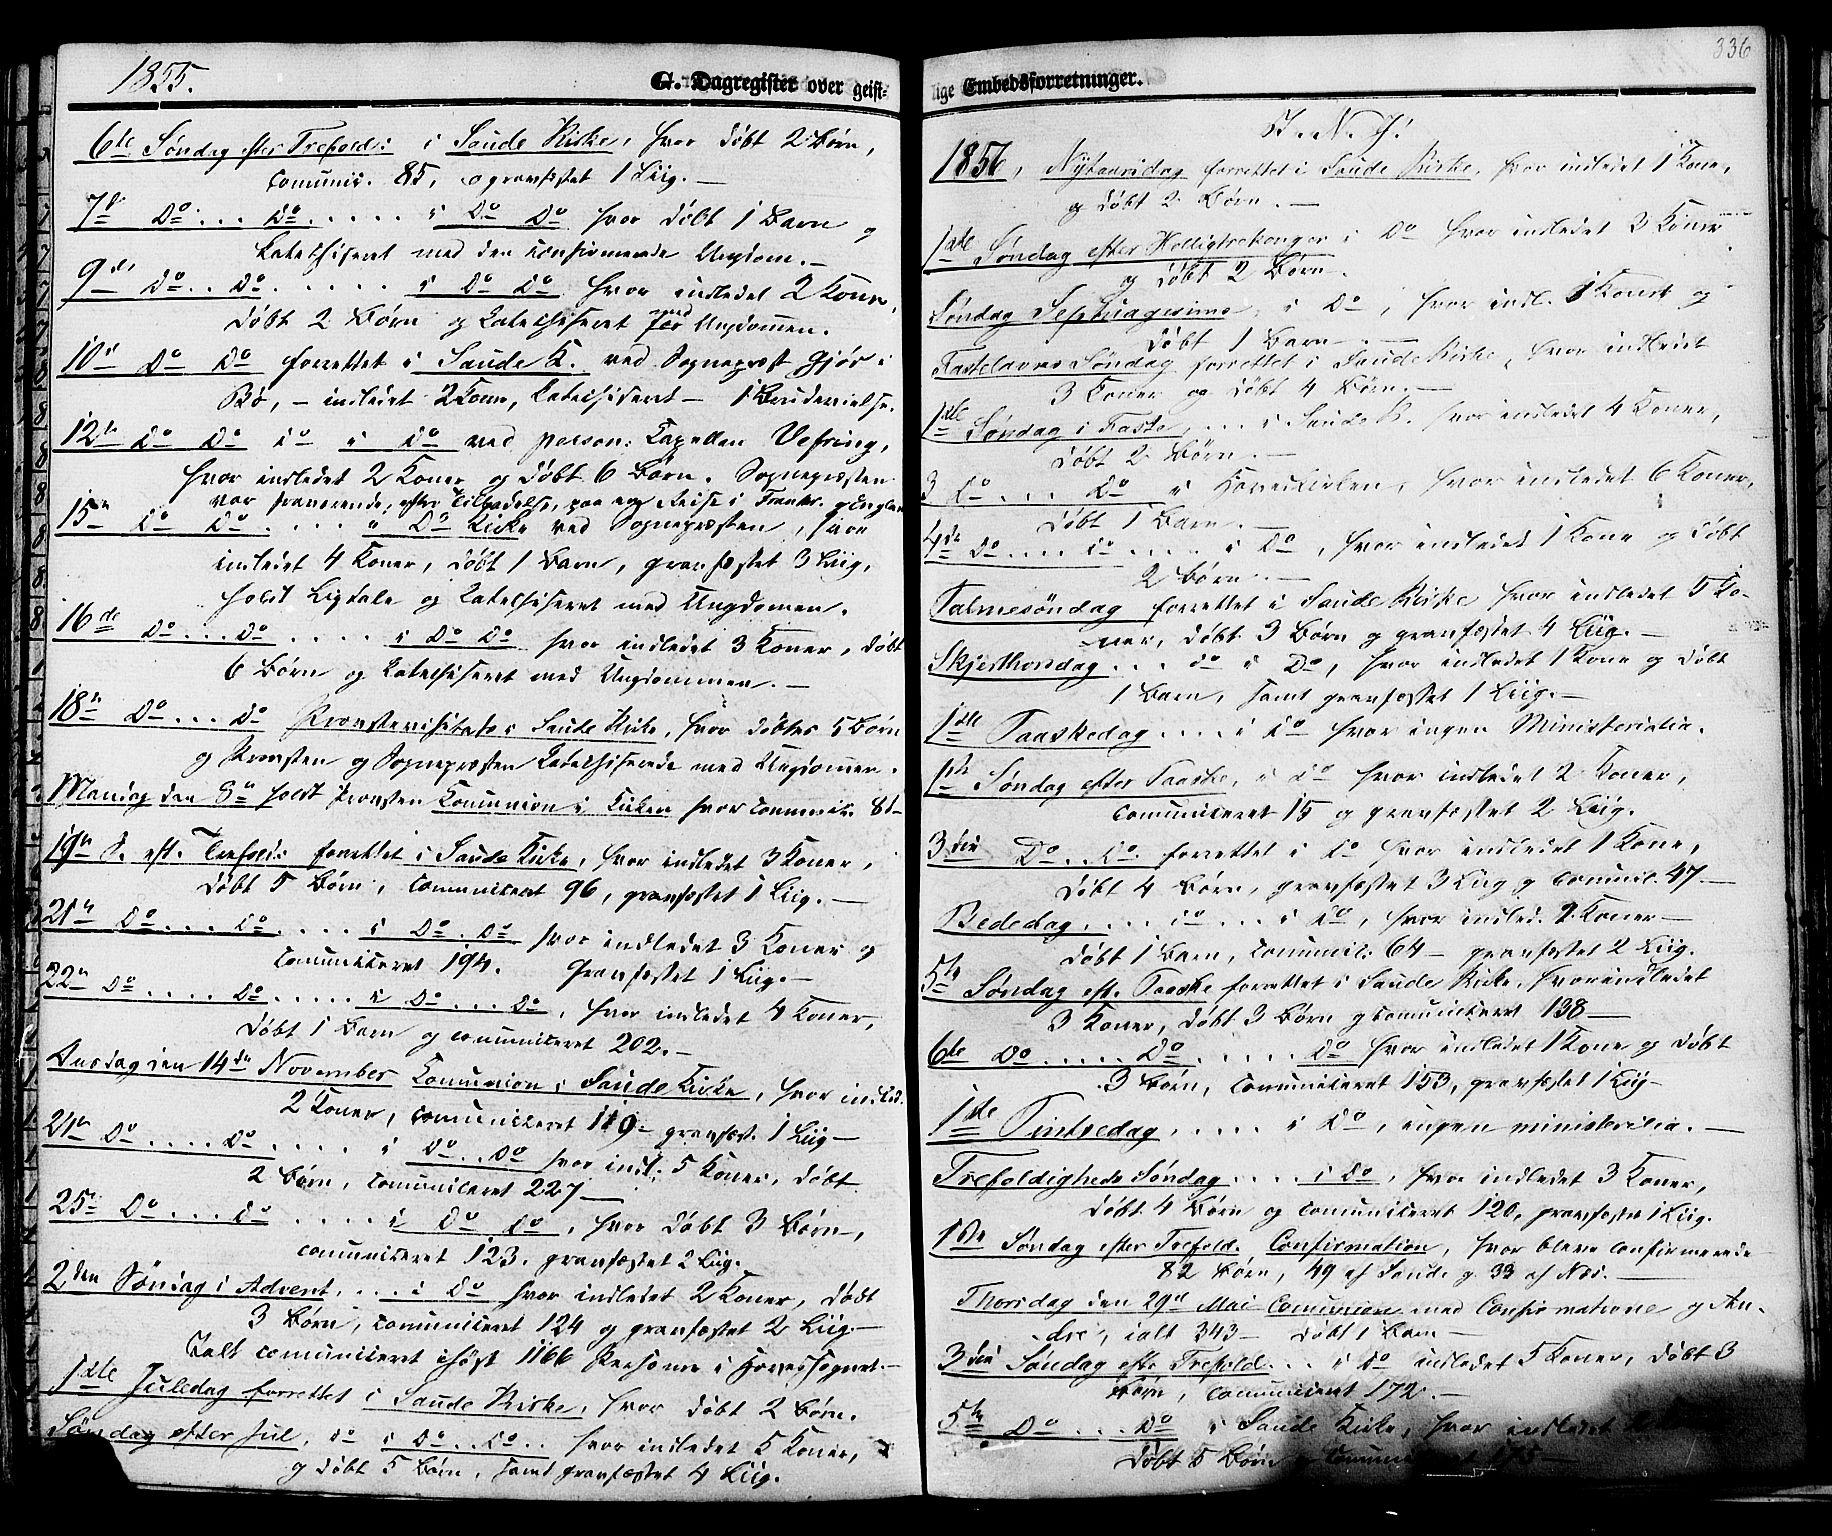 SAKO, Sauherad kirkebøker, F/Fa/L0007: Ministerialbok nr. I 7, 1851-1873, s. 336